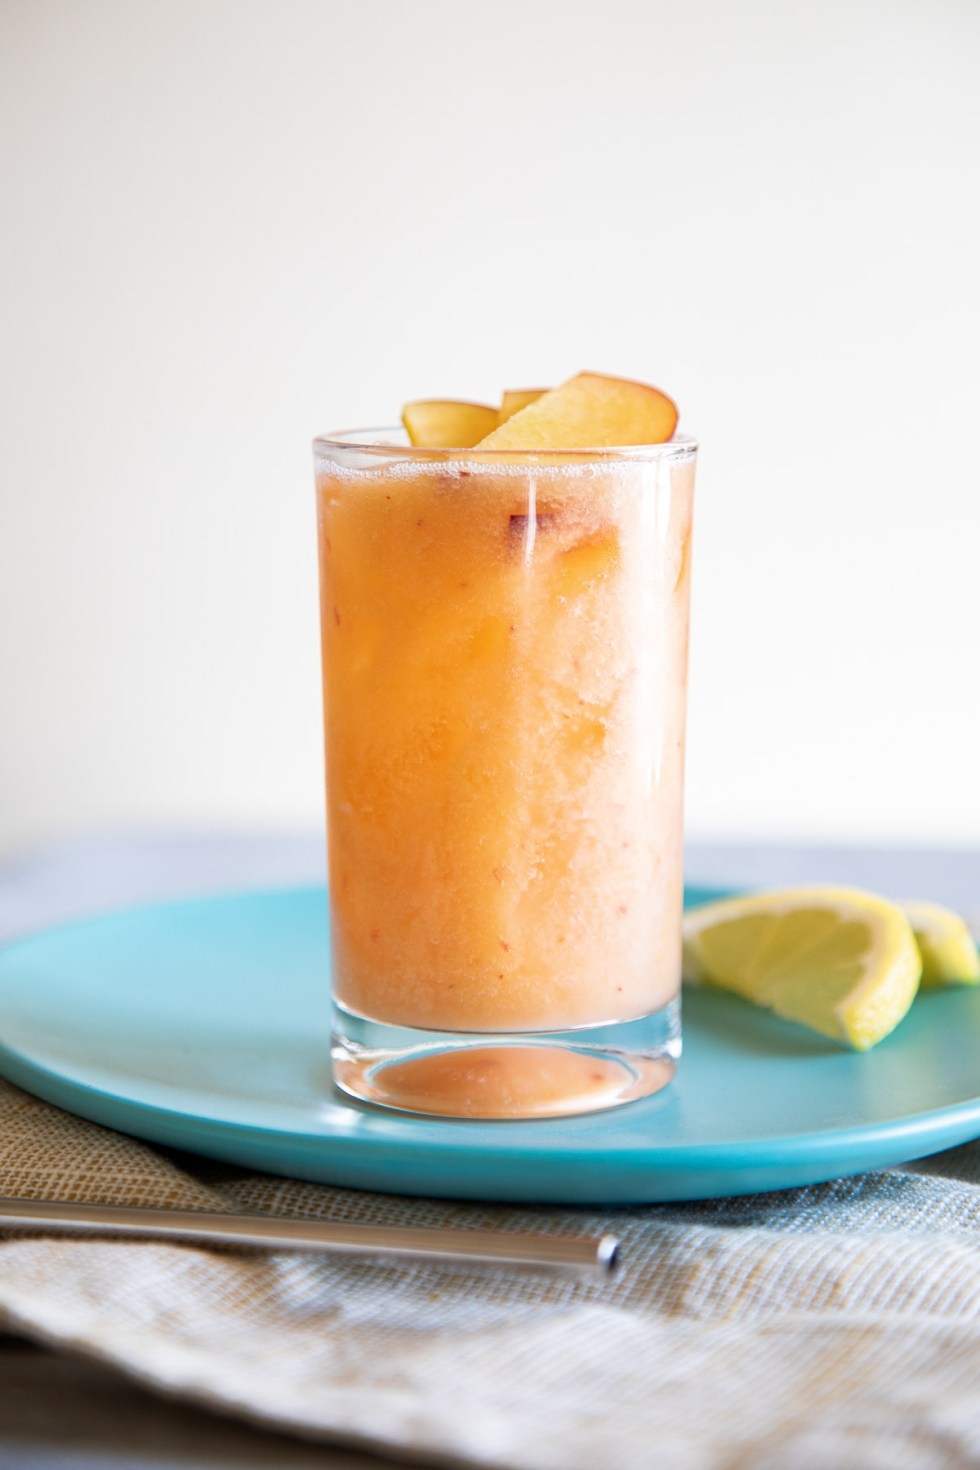 Fresh Peach Lemonade in Glass on Turquoise Plate